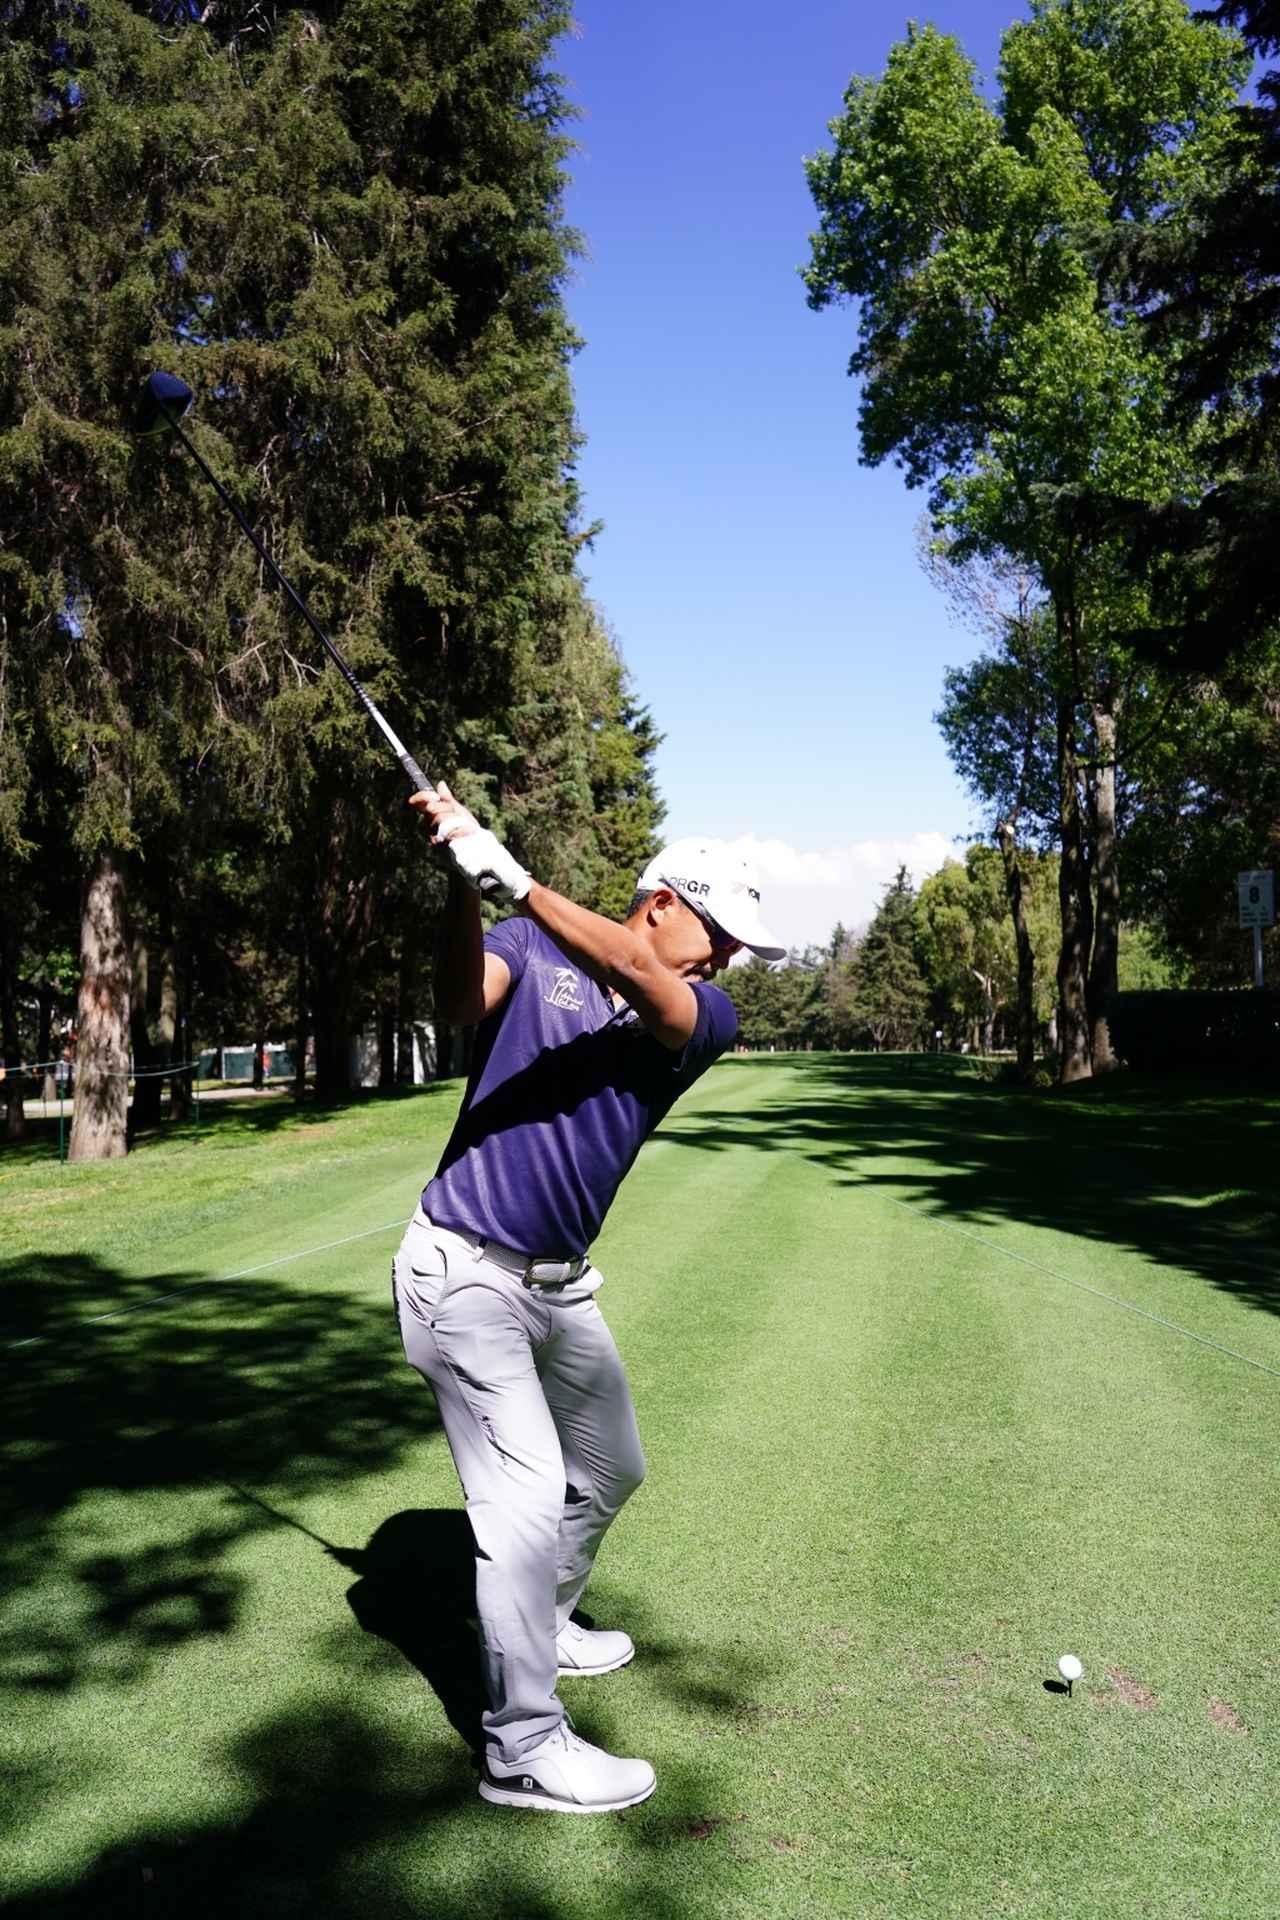 Images : 4番目の画像 - 小平智のドライバー連続写真 - みんなのゴルフダイジェスト